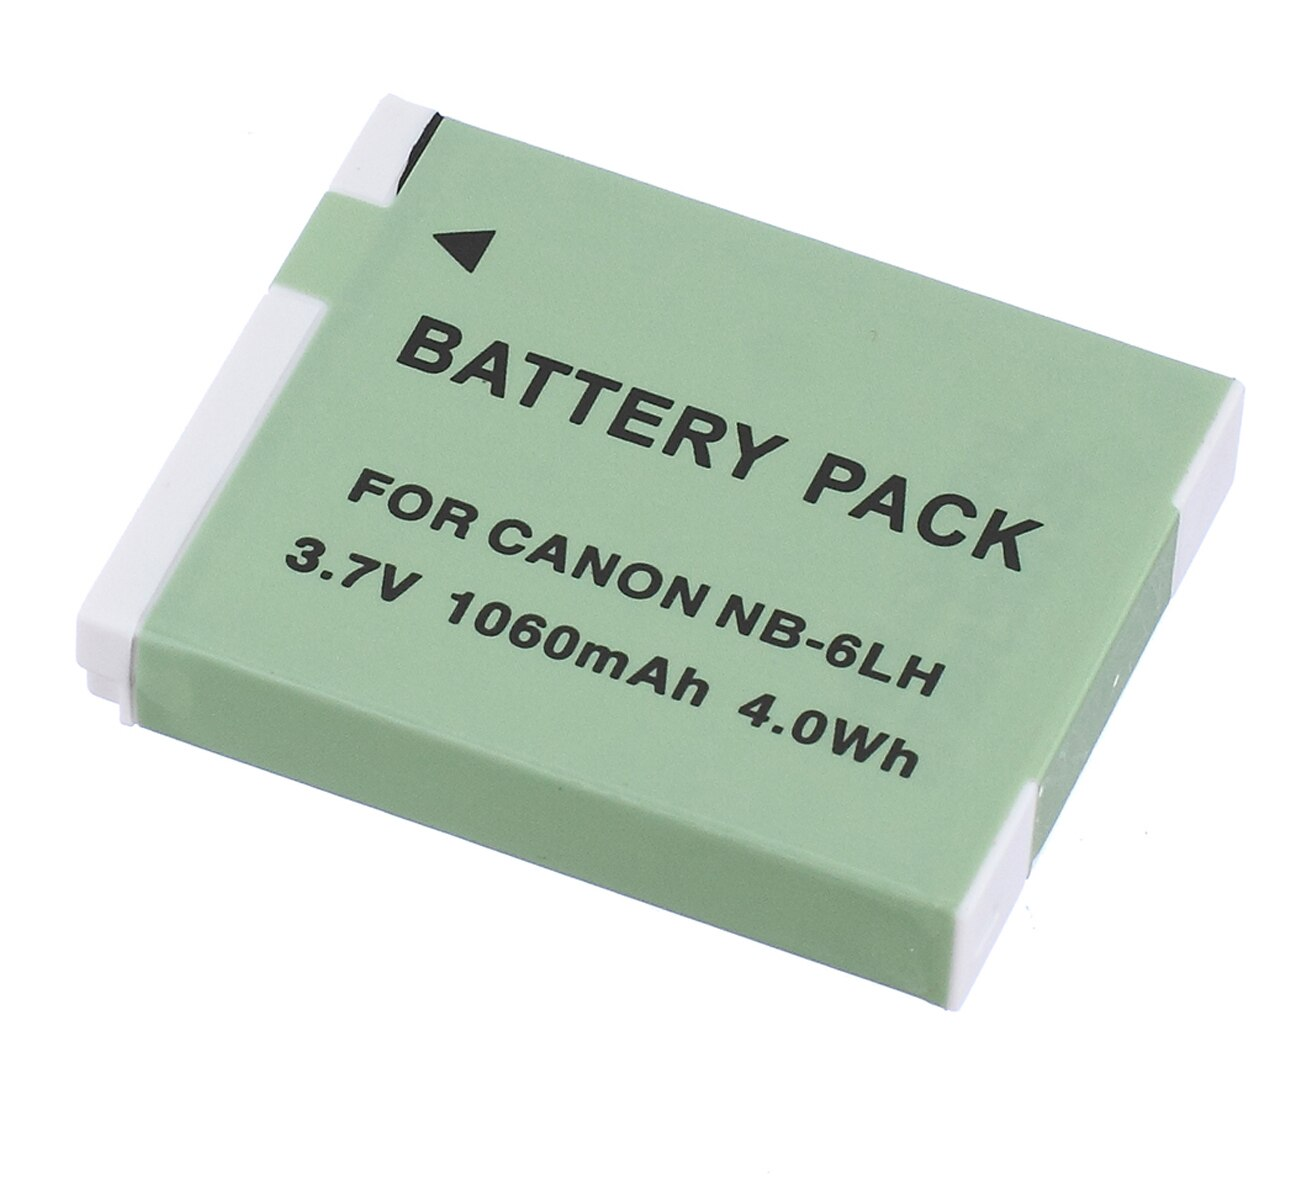 Paquete de baterías para Canon PowerShot D10, D20, D30, S90, S95, S120,...